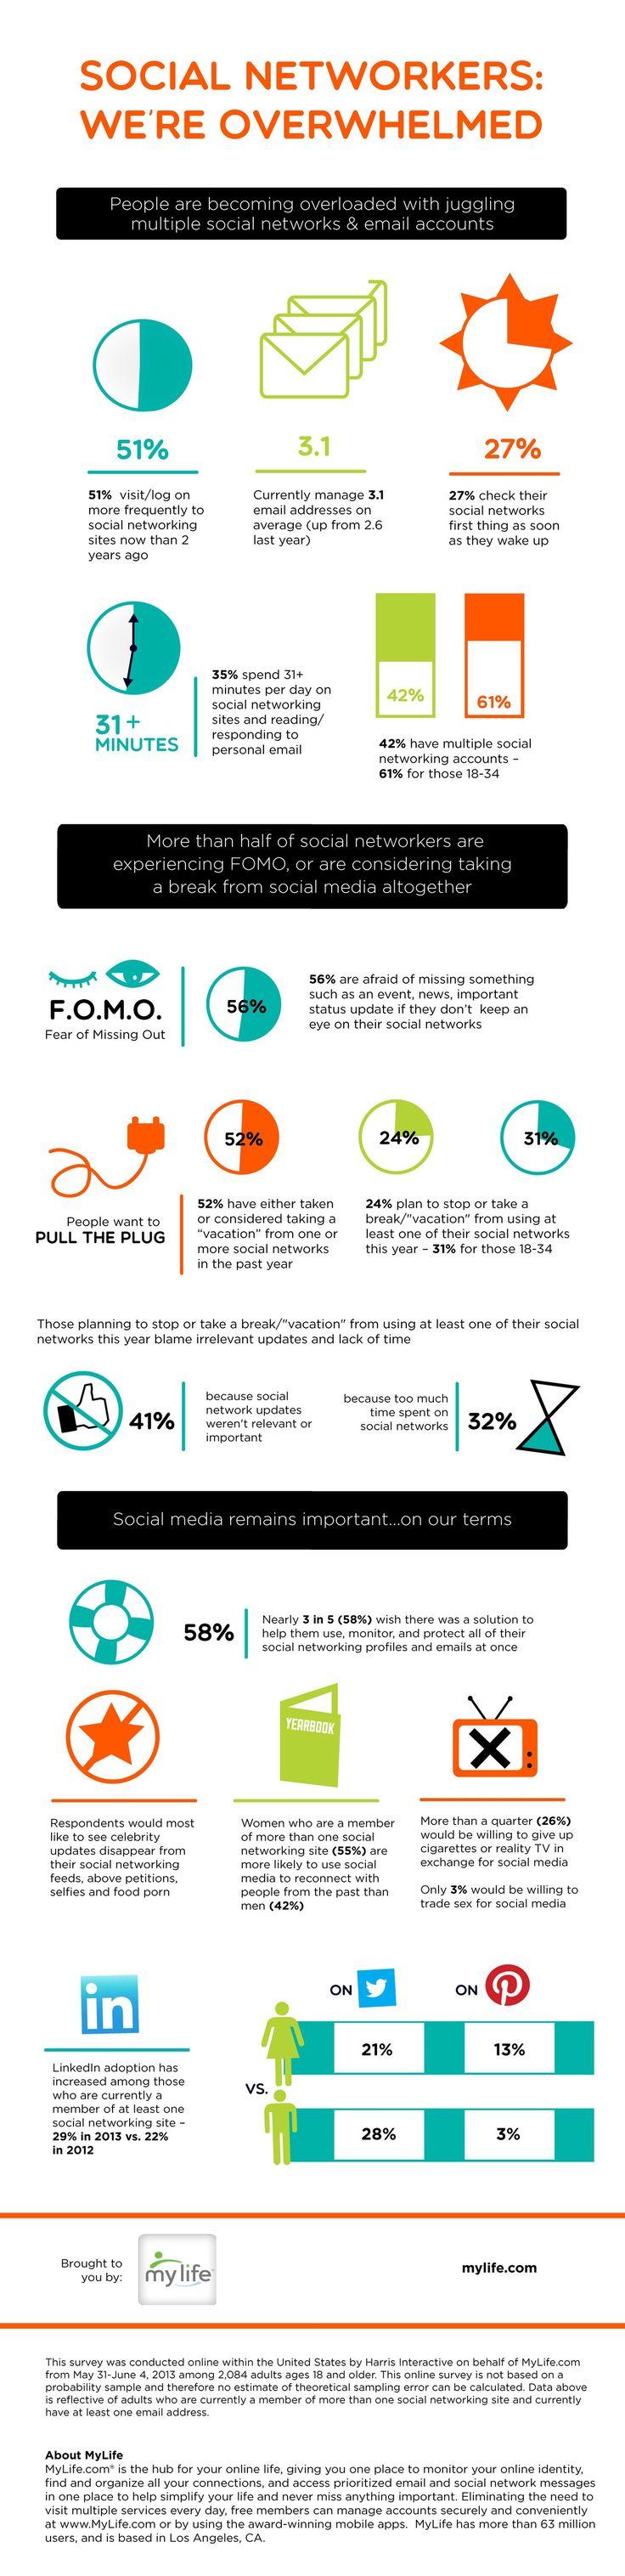 SocialMediaAddictionInfographic FOMO